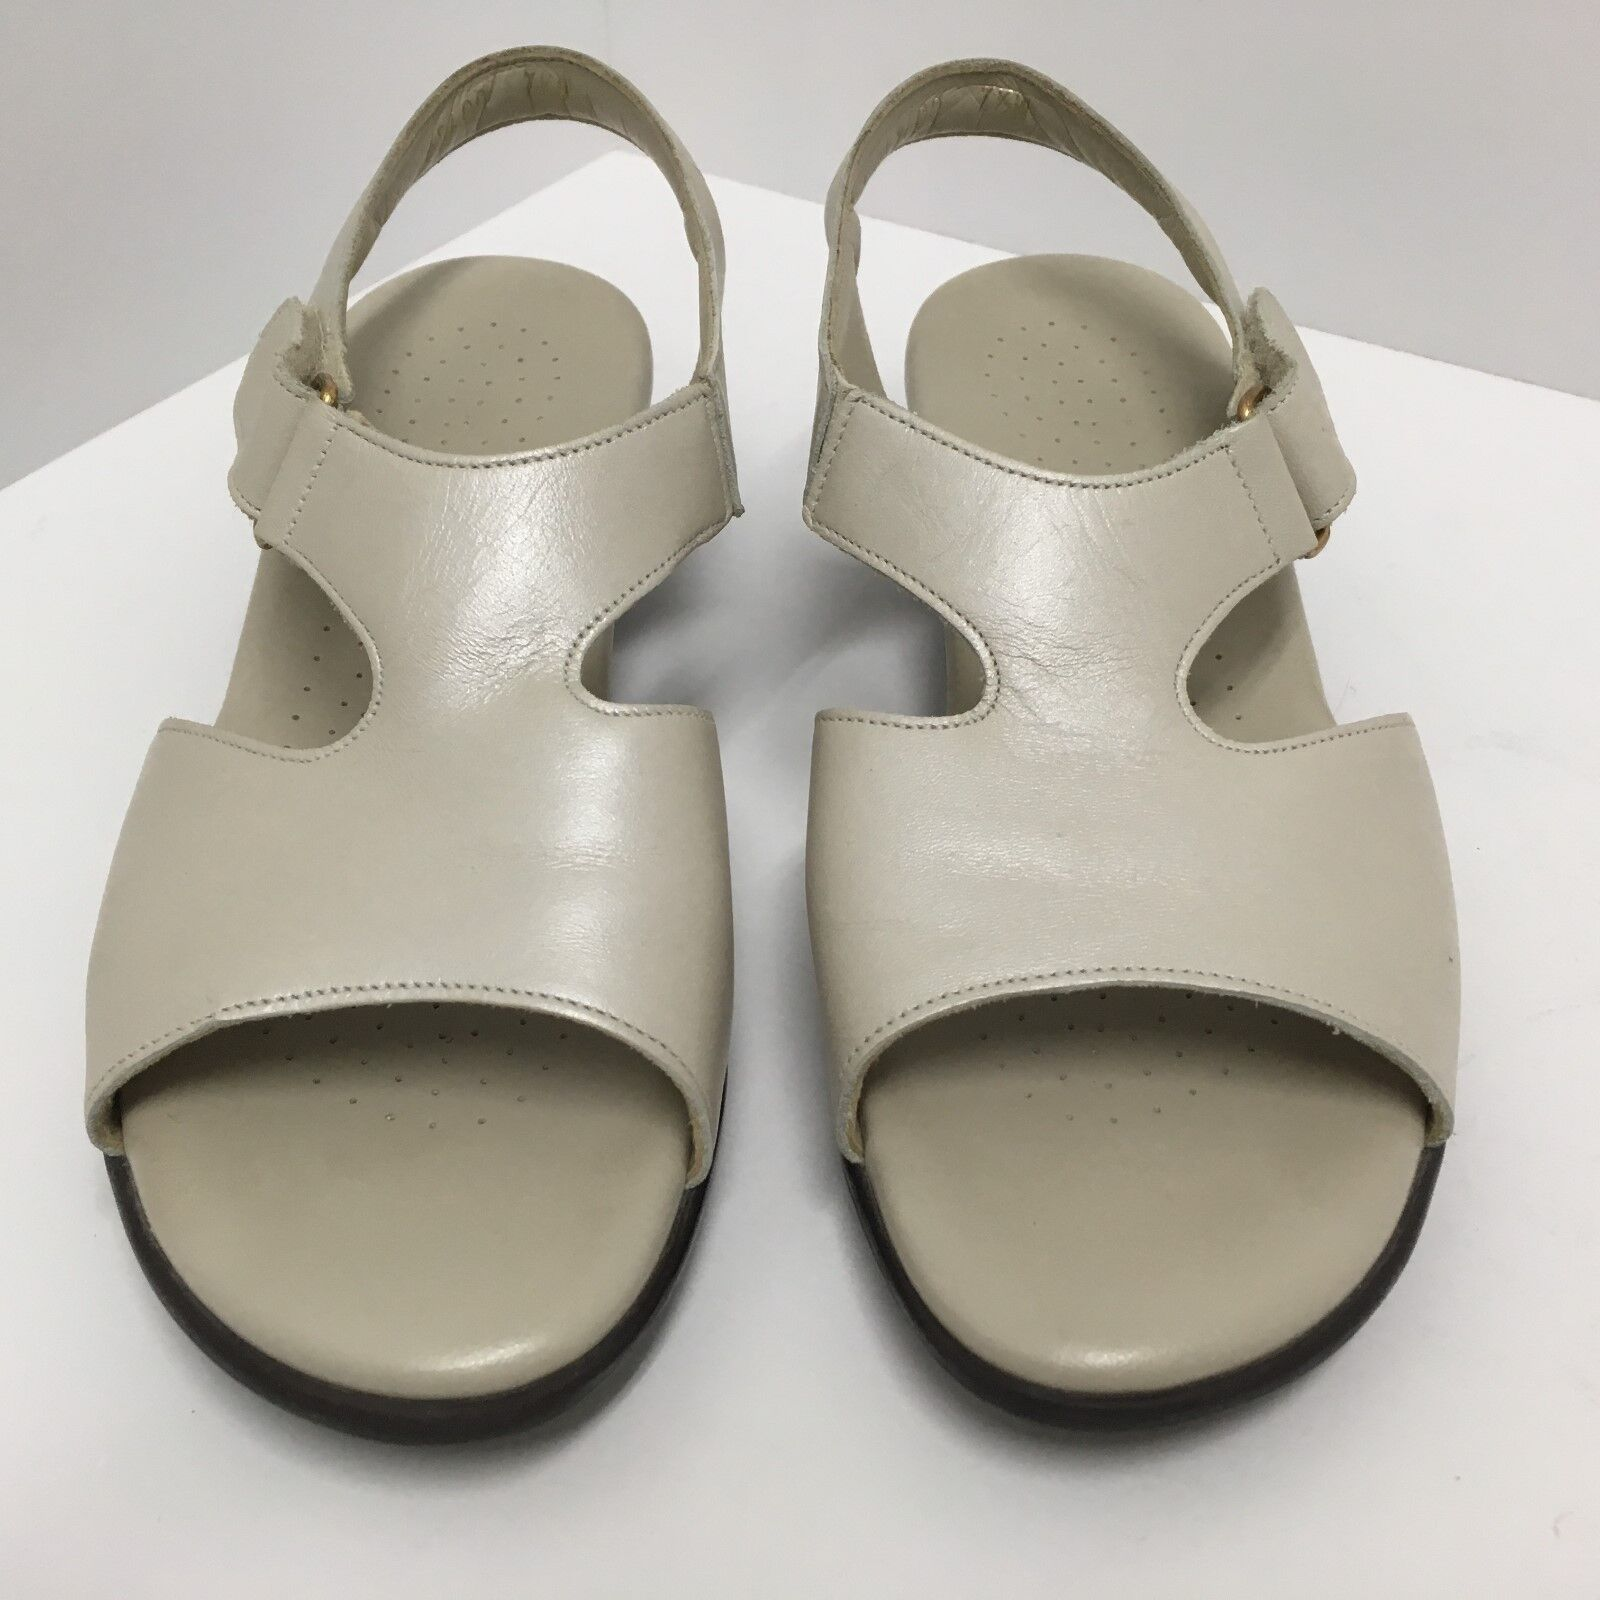 SAS Tripad Comfort Suntimer Beige Leather Sandals Ankle Strap Women's Size 7.5 W